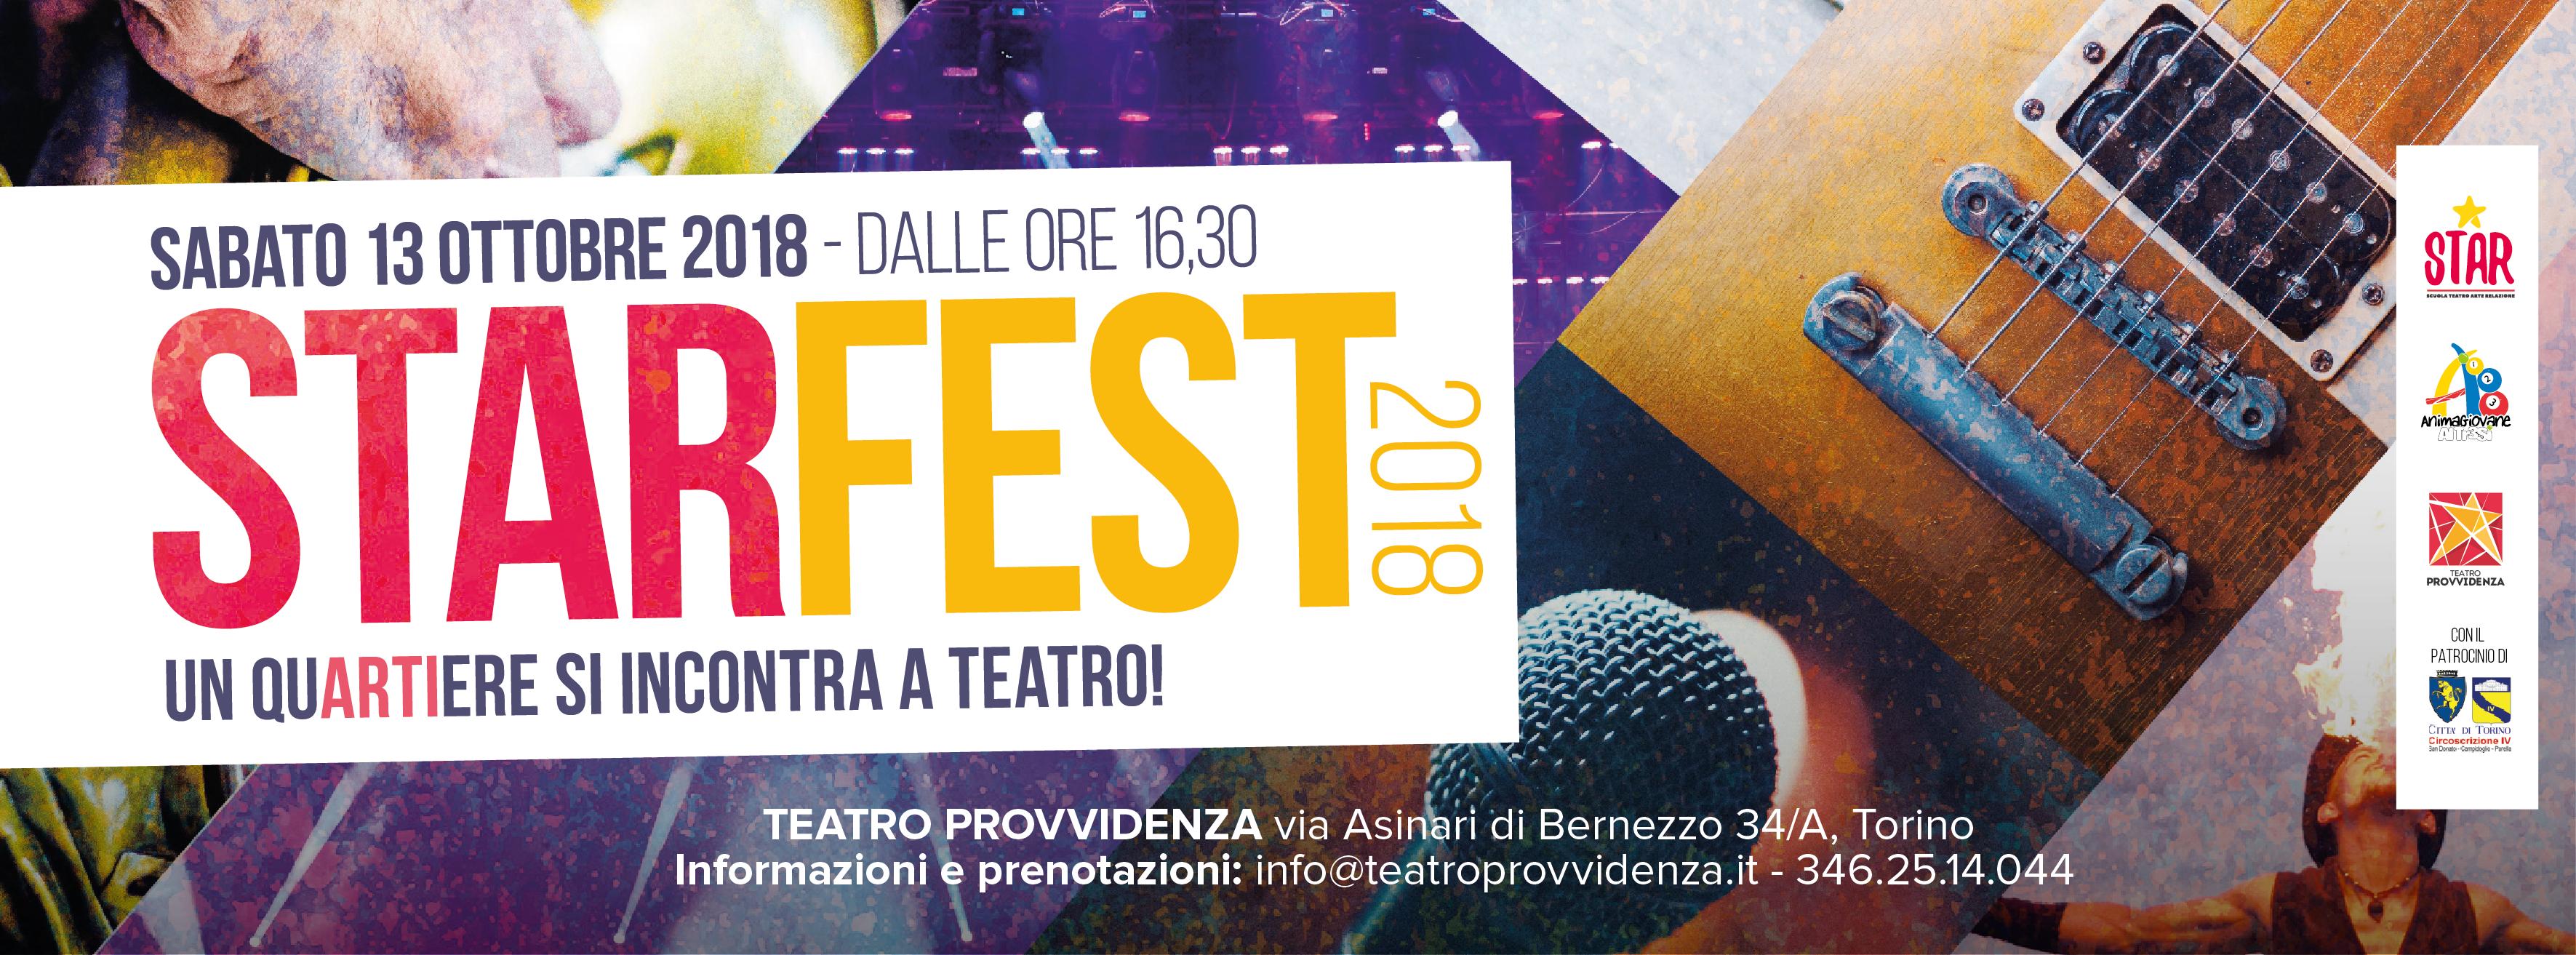 TP-BannerSito-STARfest2018-01